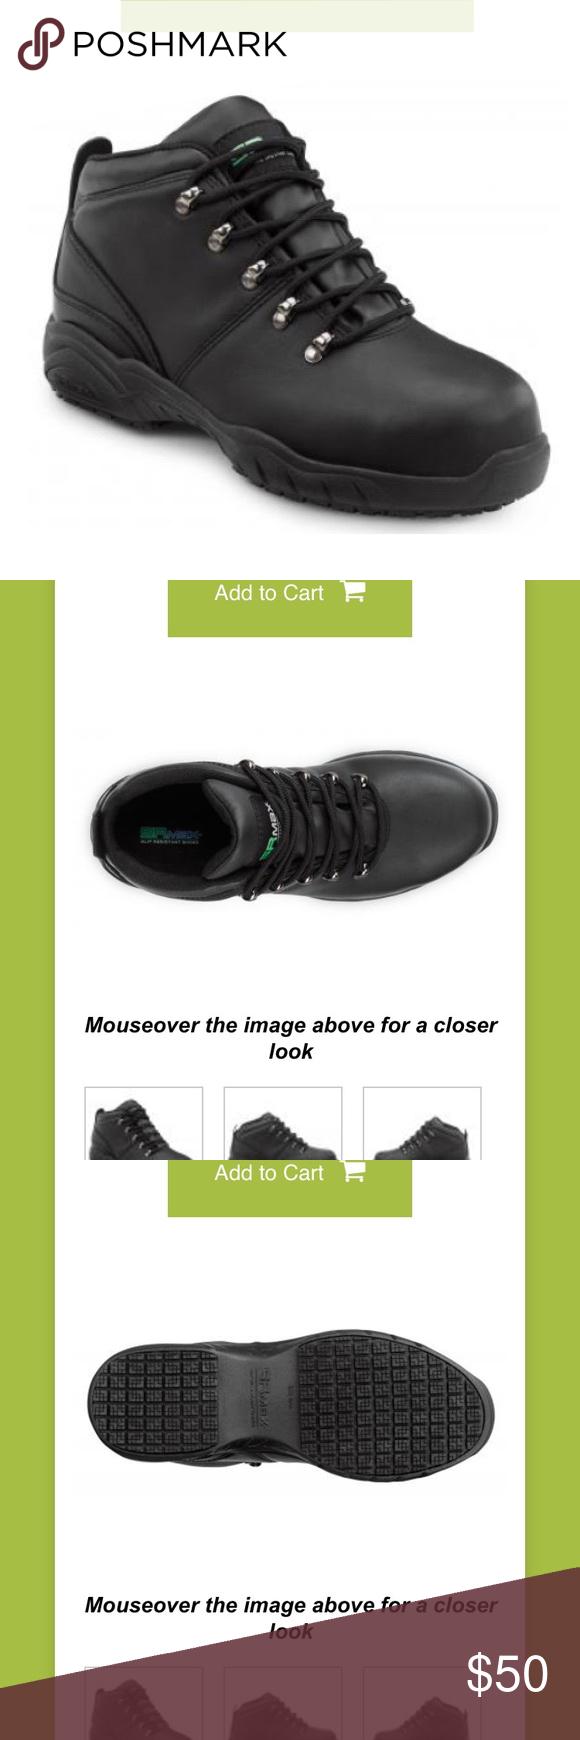 SR Max SRM225 waterproof safety toe